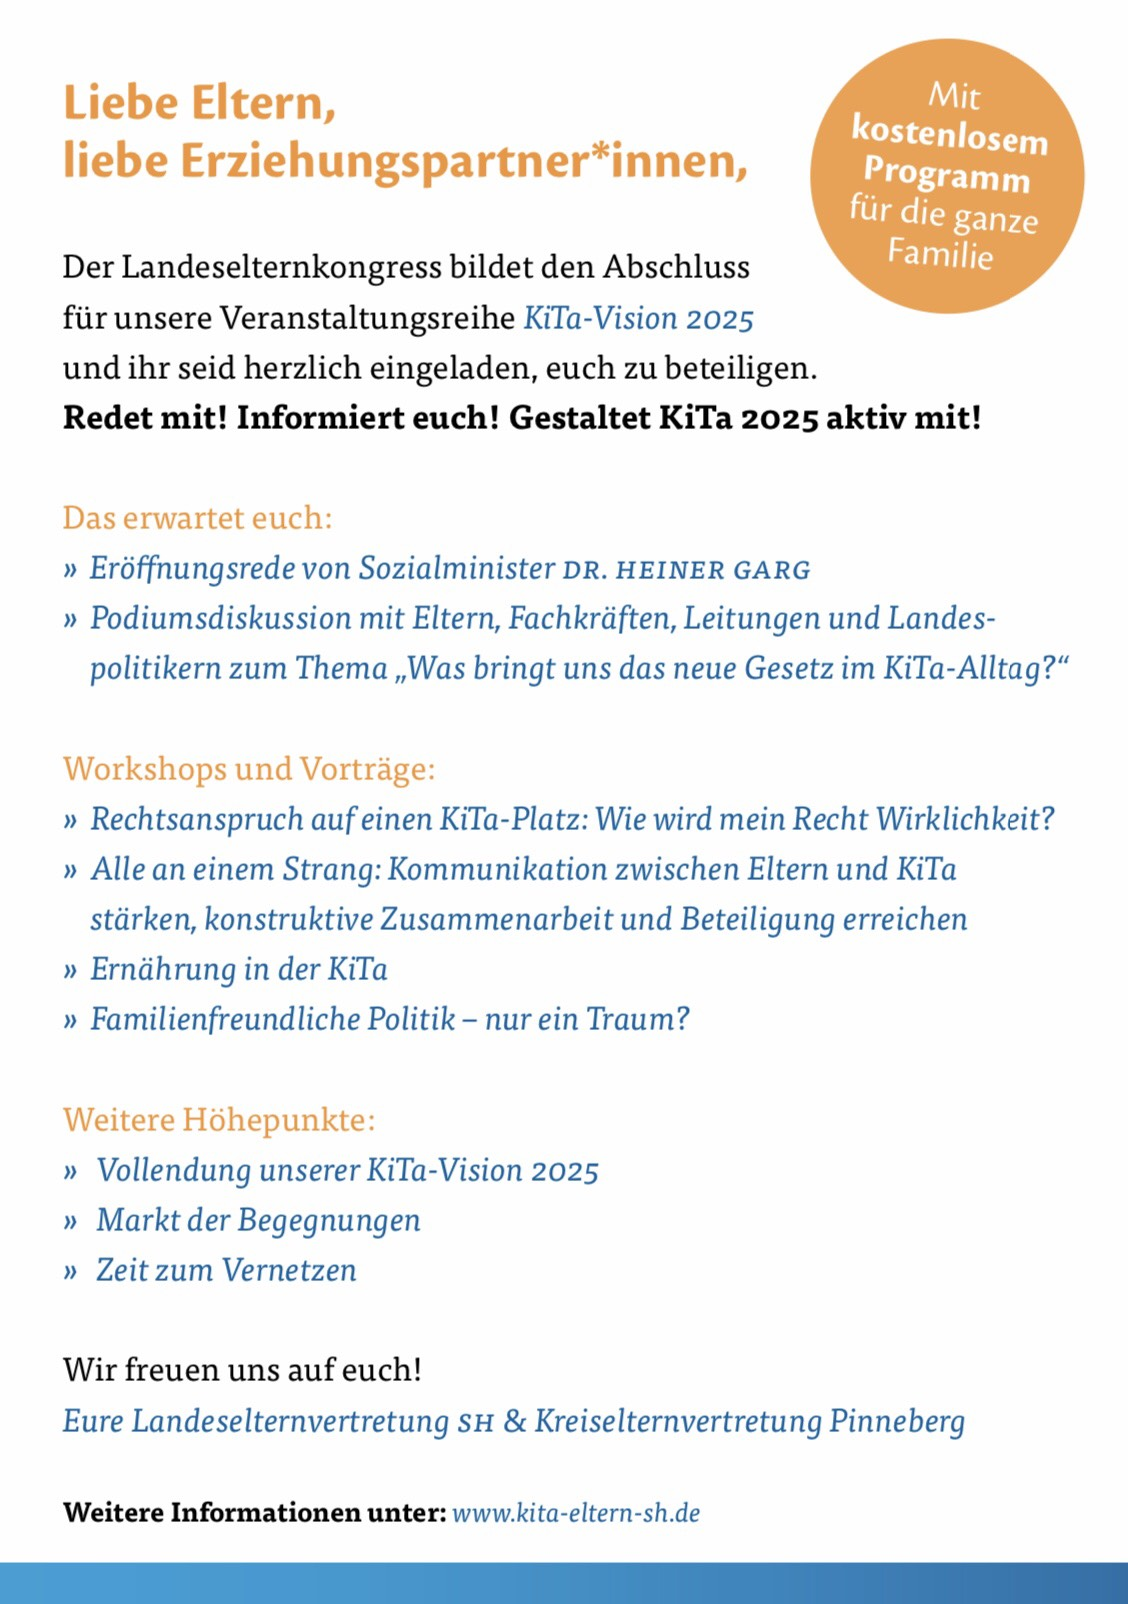 Freie-Demokraten-FDP-Stadtverband-Wedel-Soziales-Kita-Landeselternkongress-Plakat-Rückseite